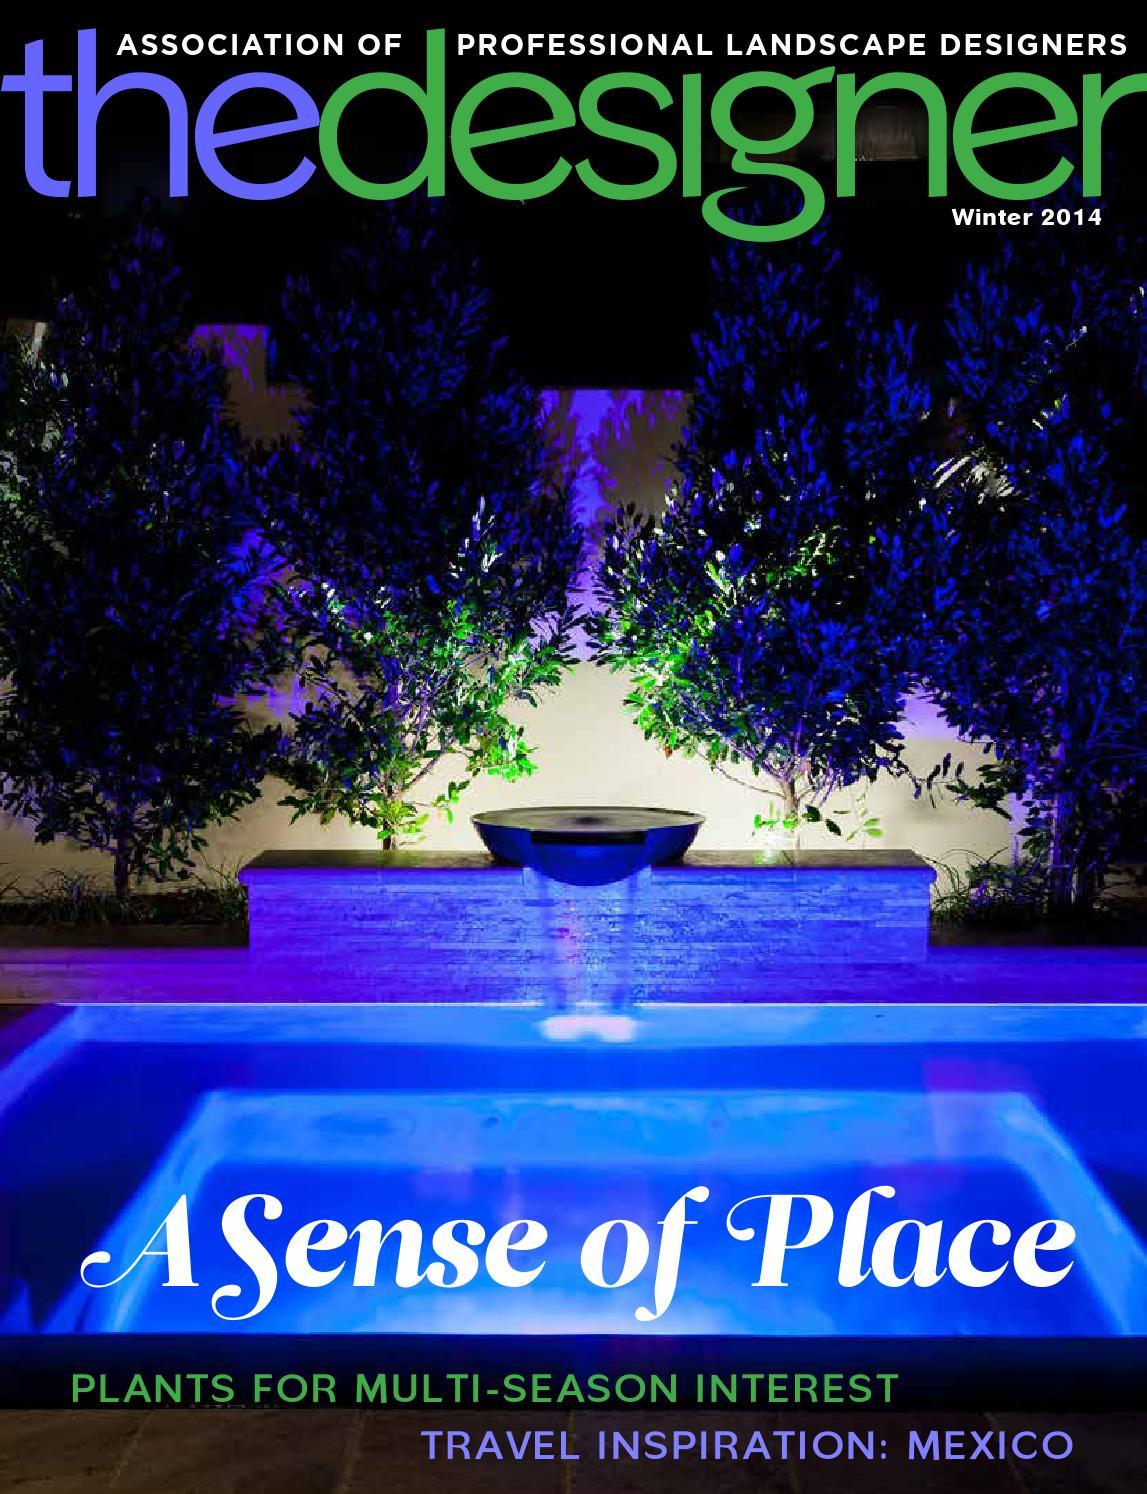 Association Of Professional Landscape Designers  APLD The Designer Winter 2014 by Association of